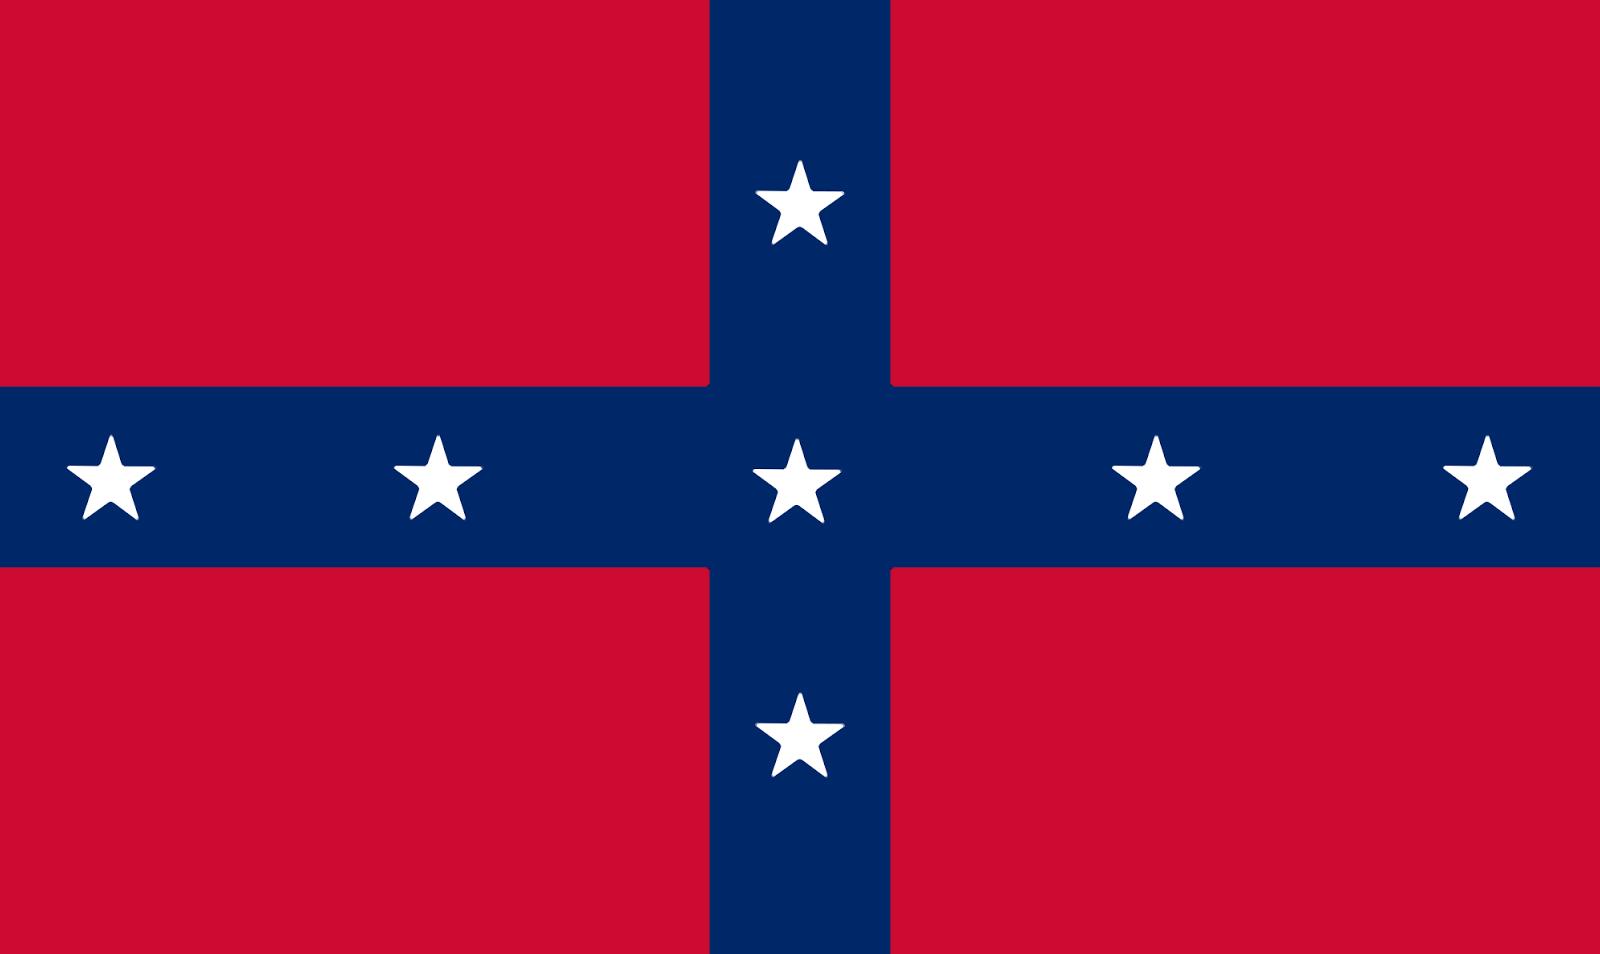 Chris Impens Valvas Ancestry Of The Confederate Battle